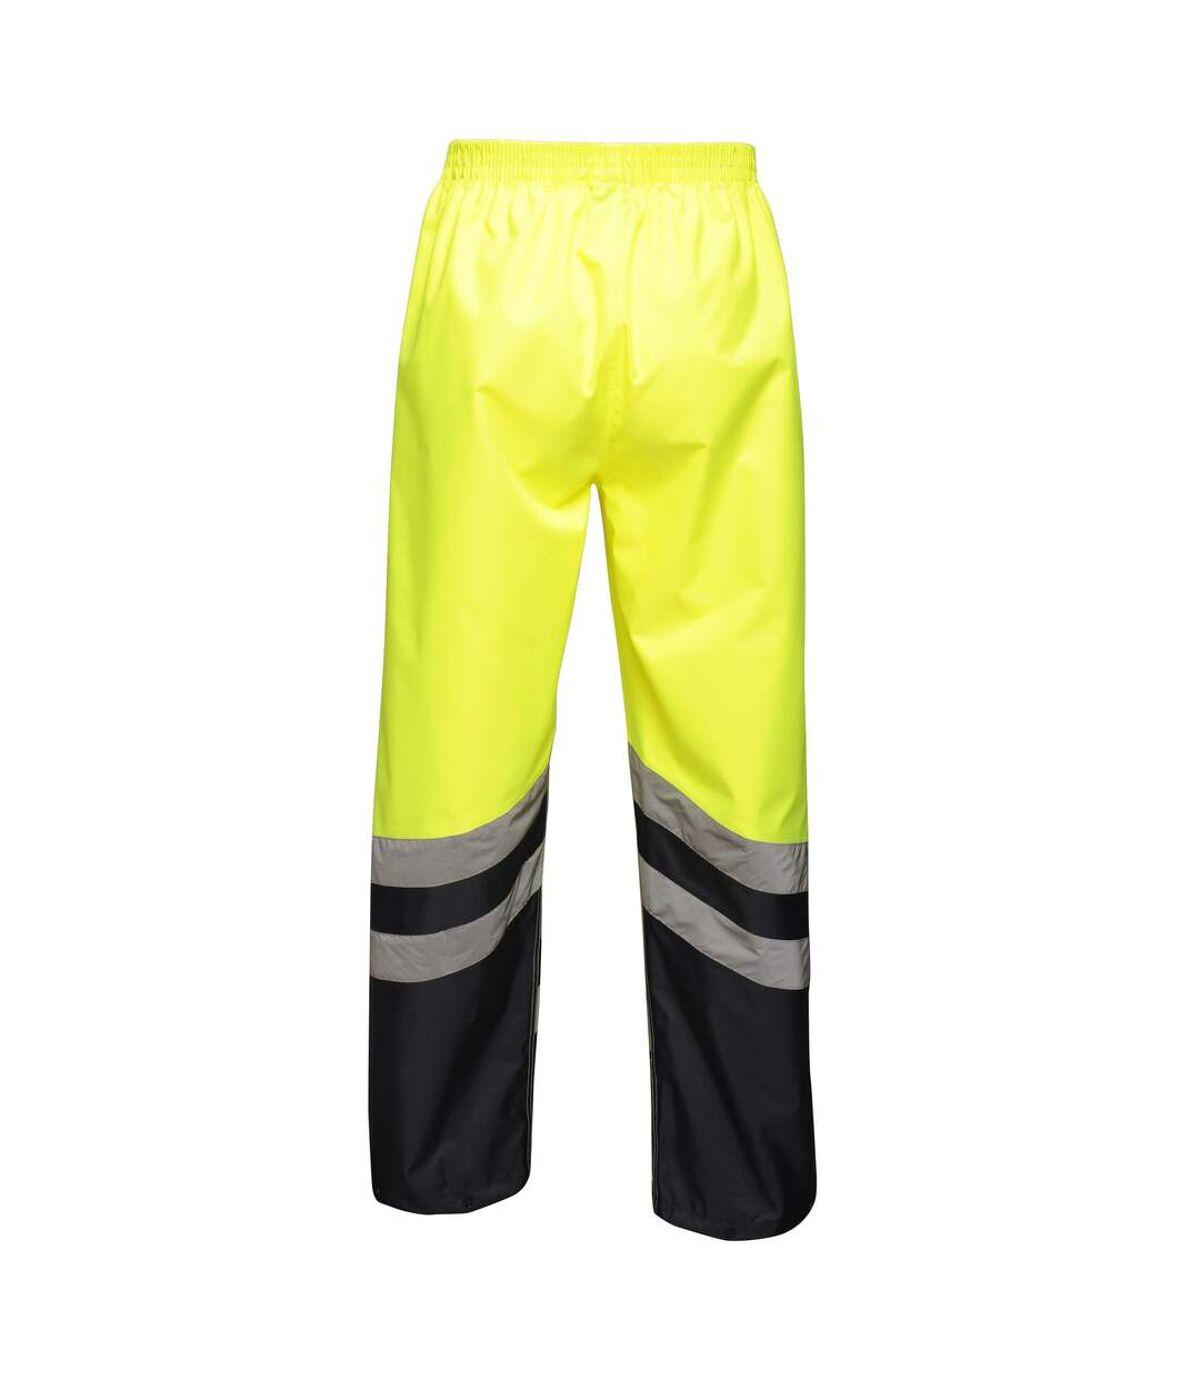 Regatta Unisex Hi Vis Pro Reflective Work Over Trousers (Yellow/Navy) - UTRG3980